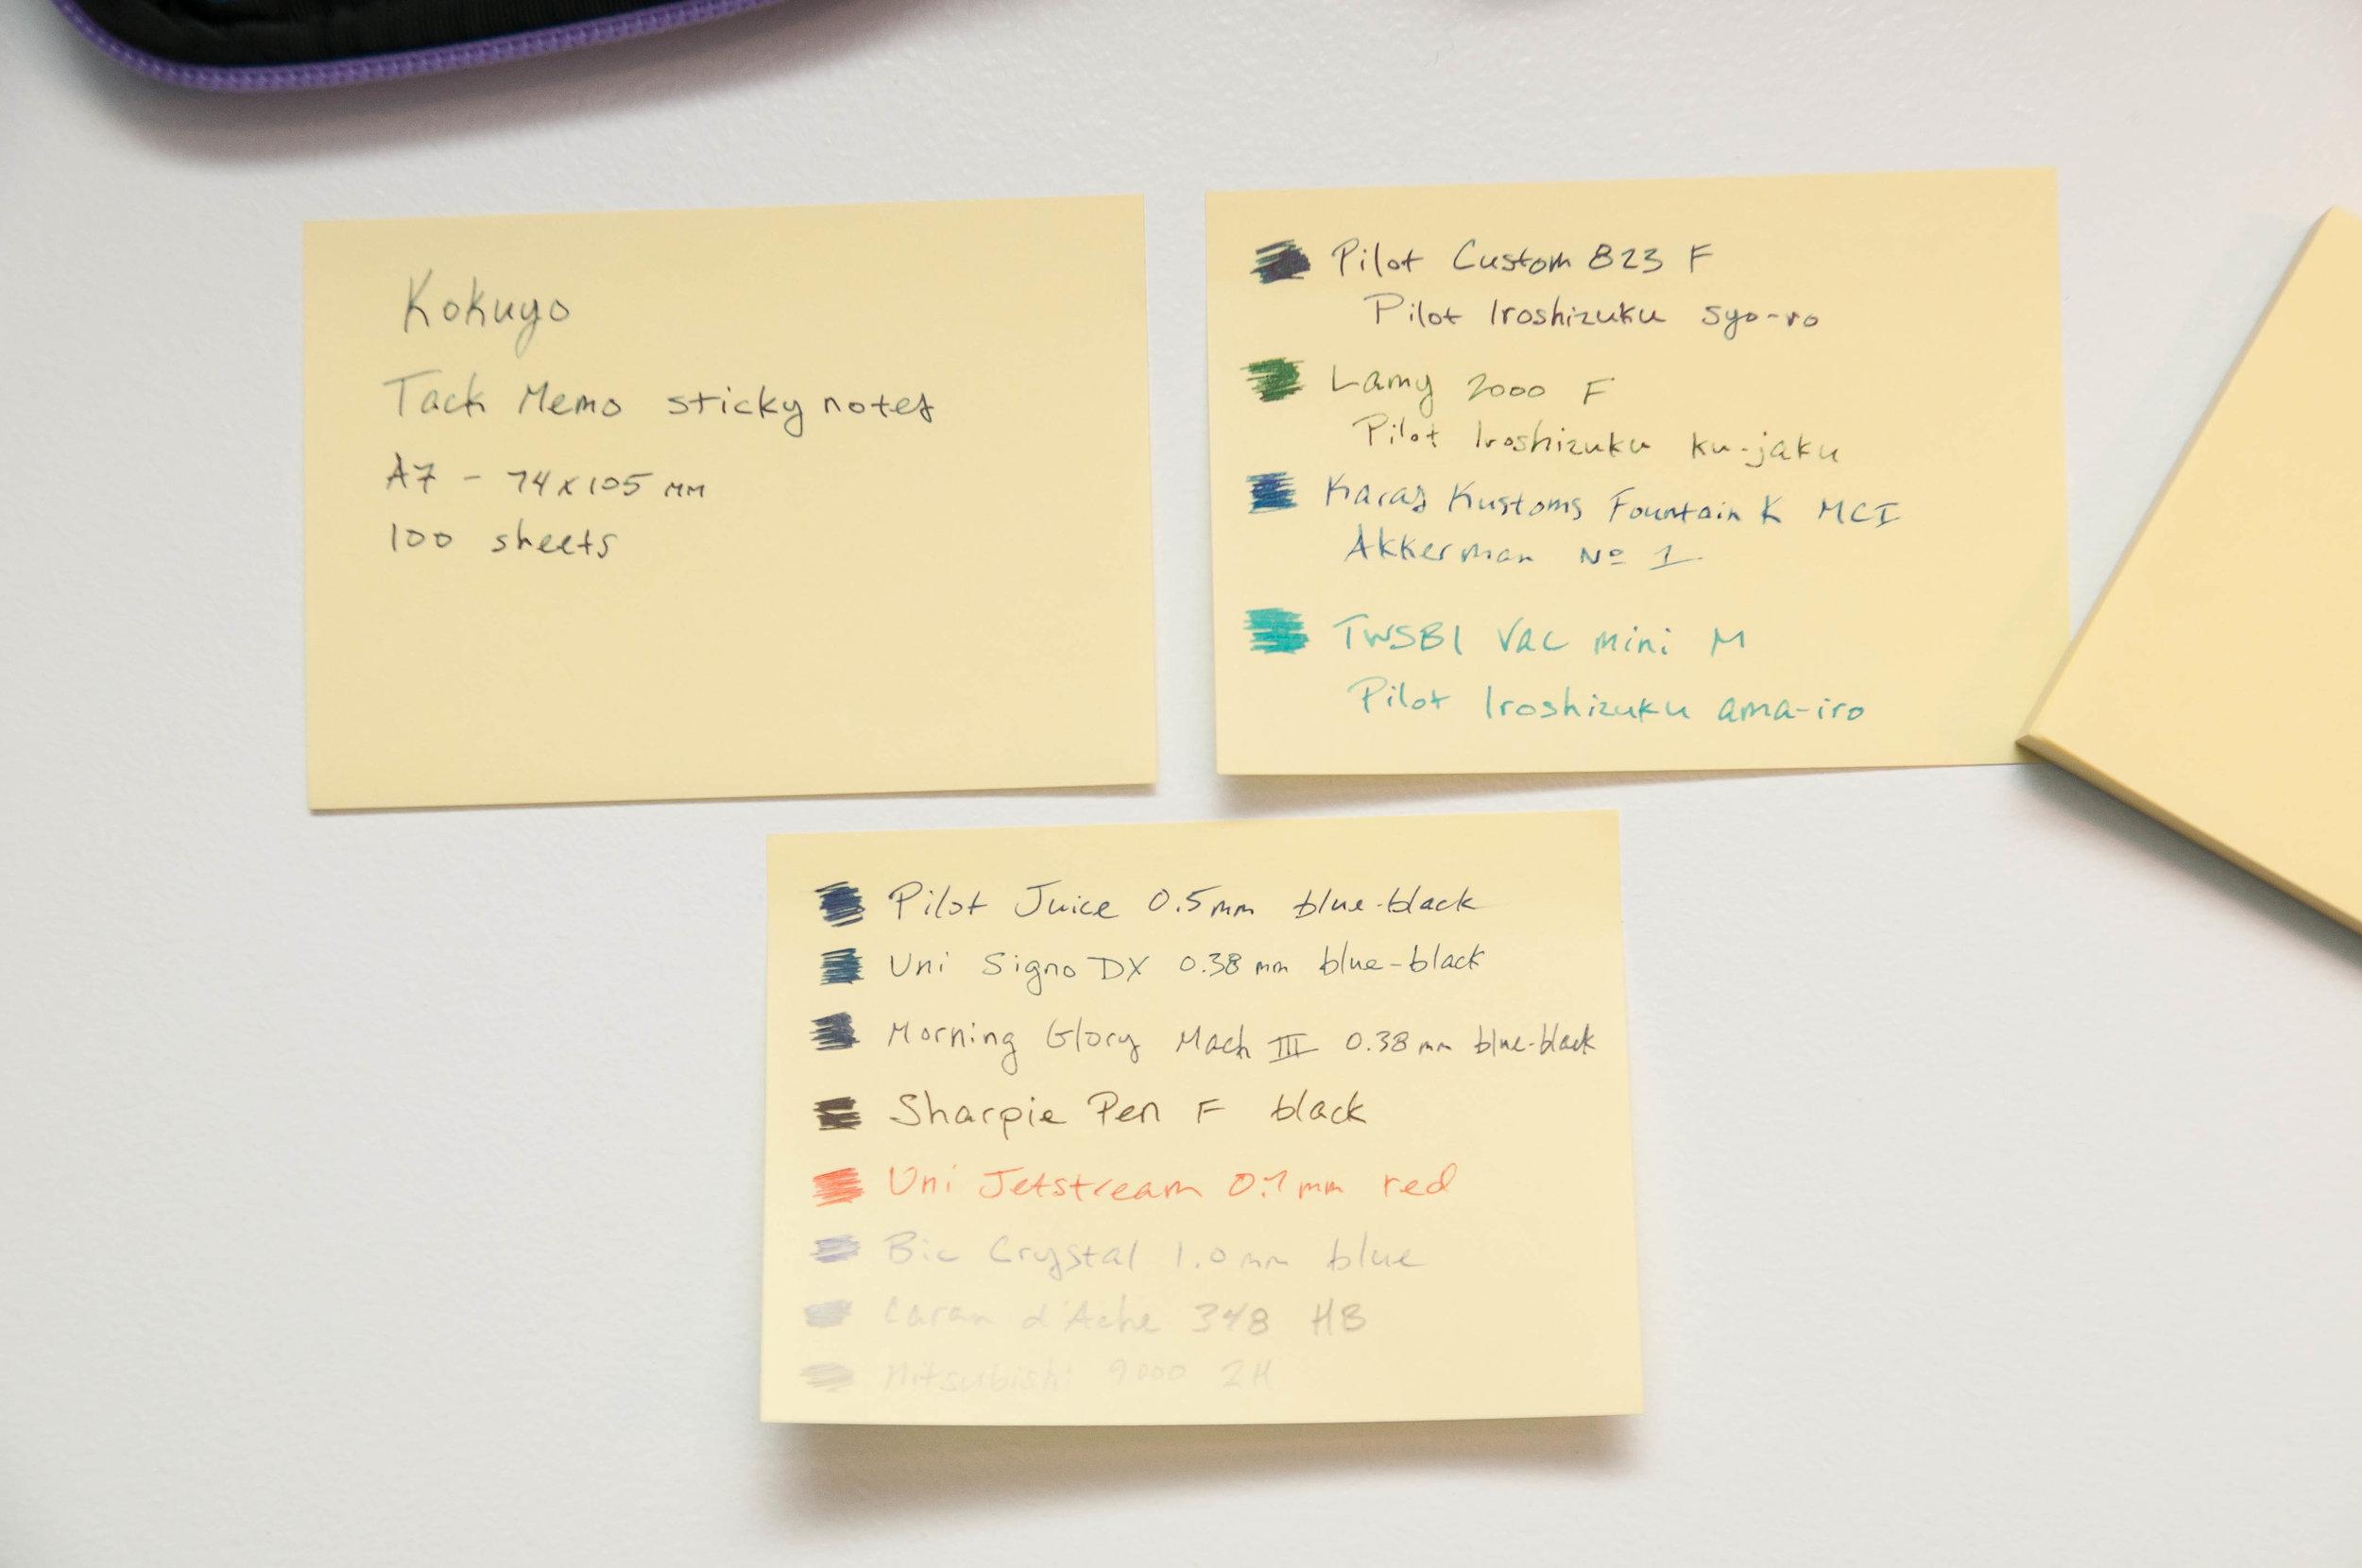 Kokuyo Tack Memo Sticky Notes Writing